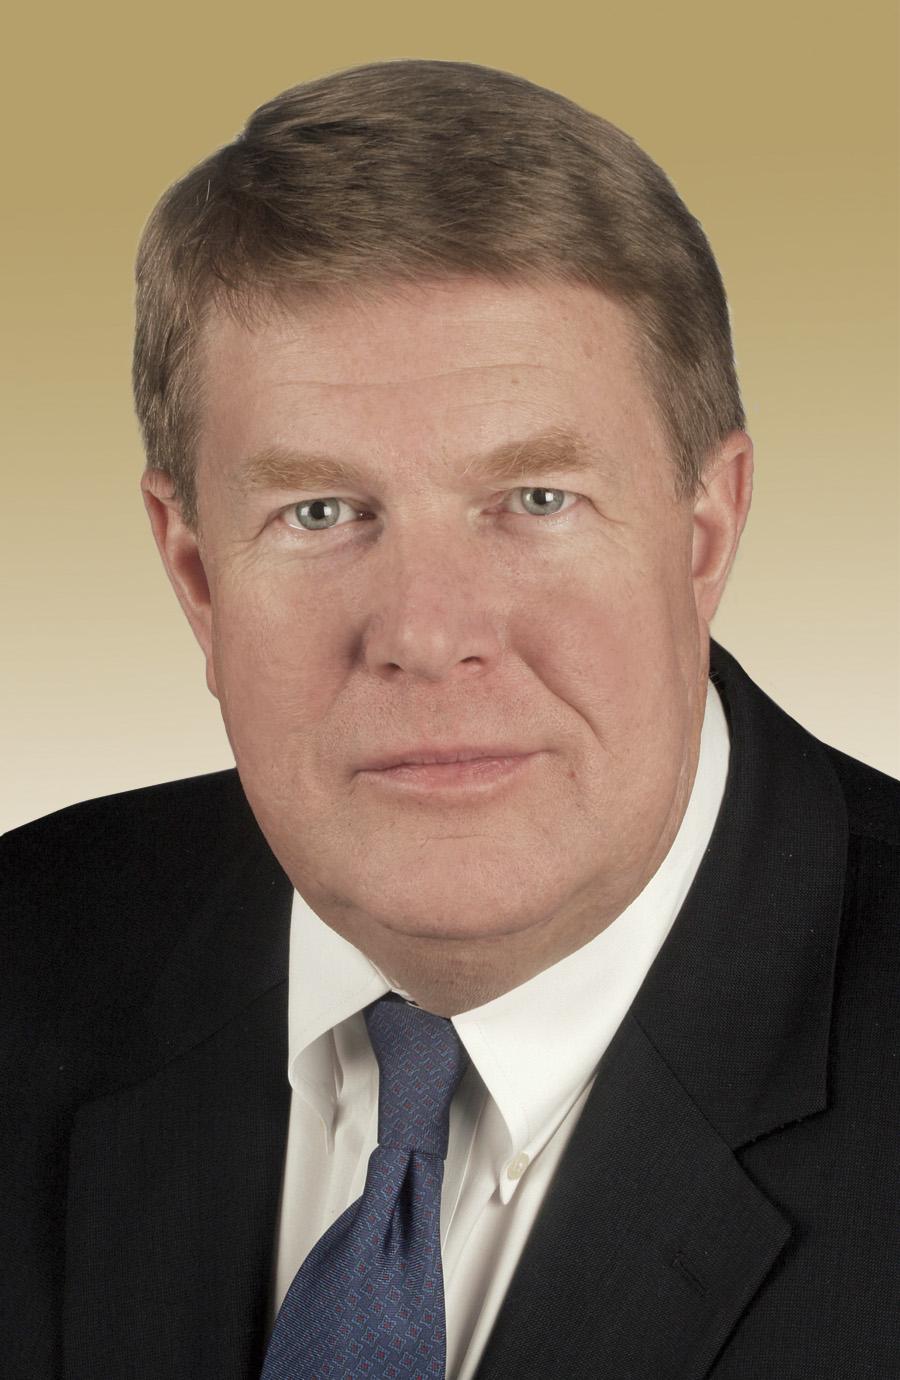 Dave Ogrean